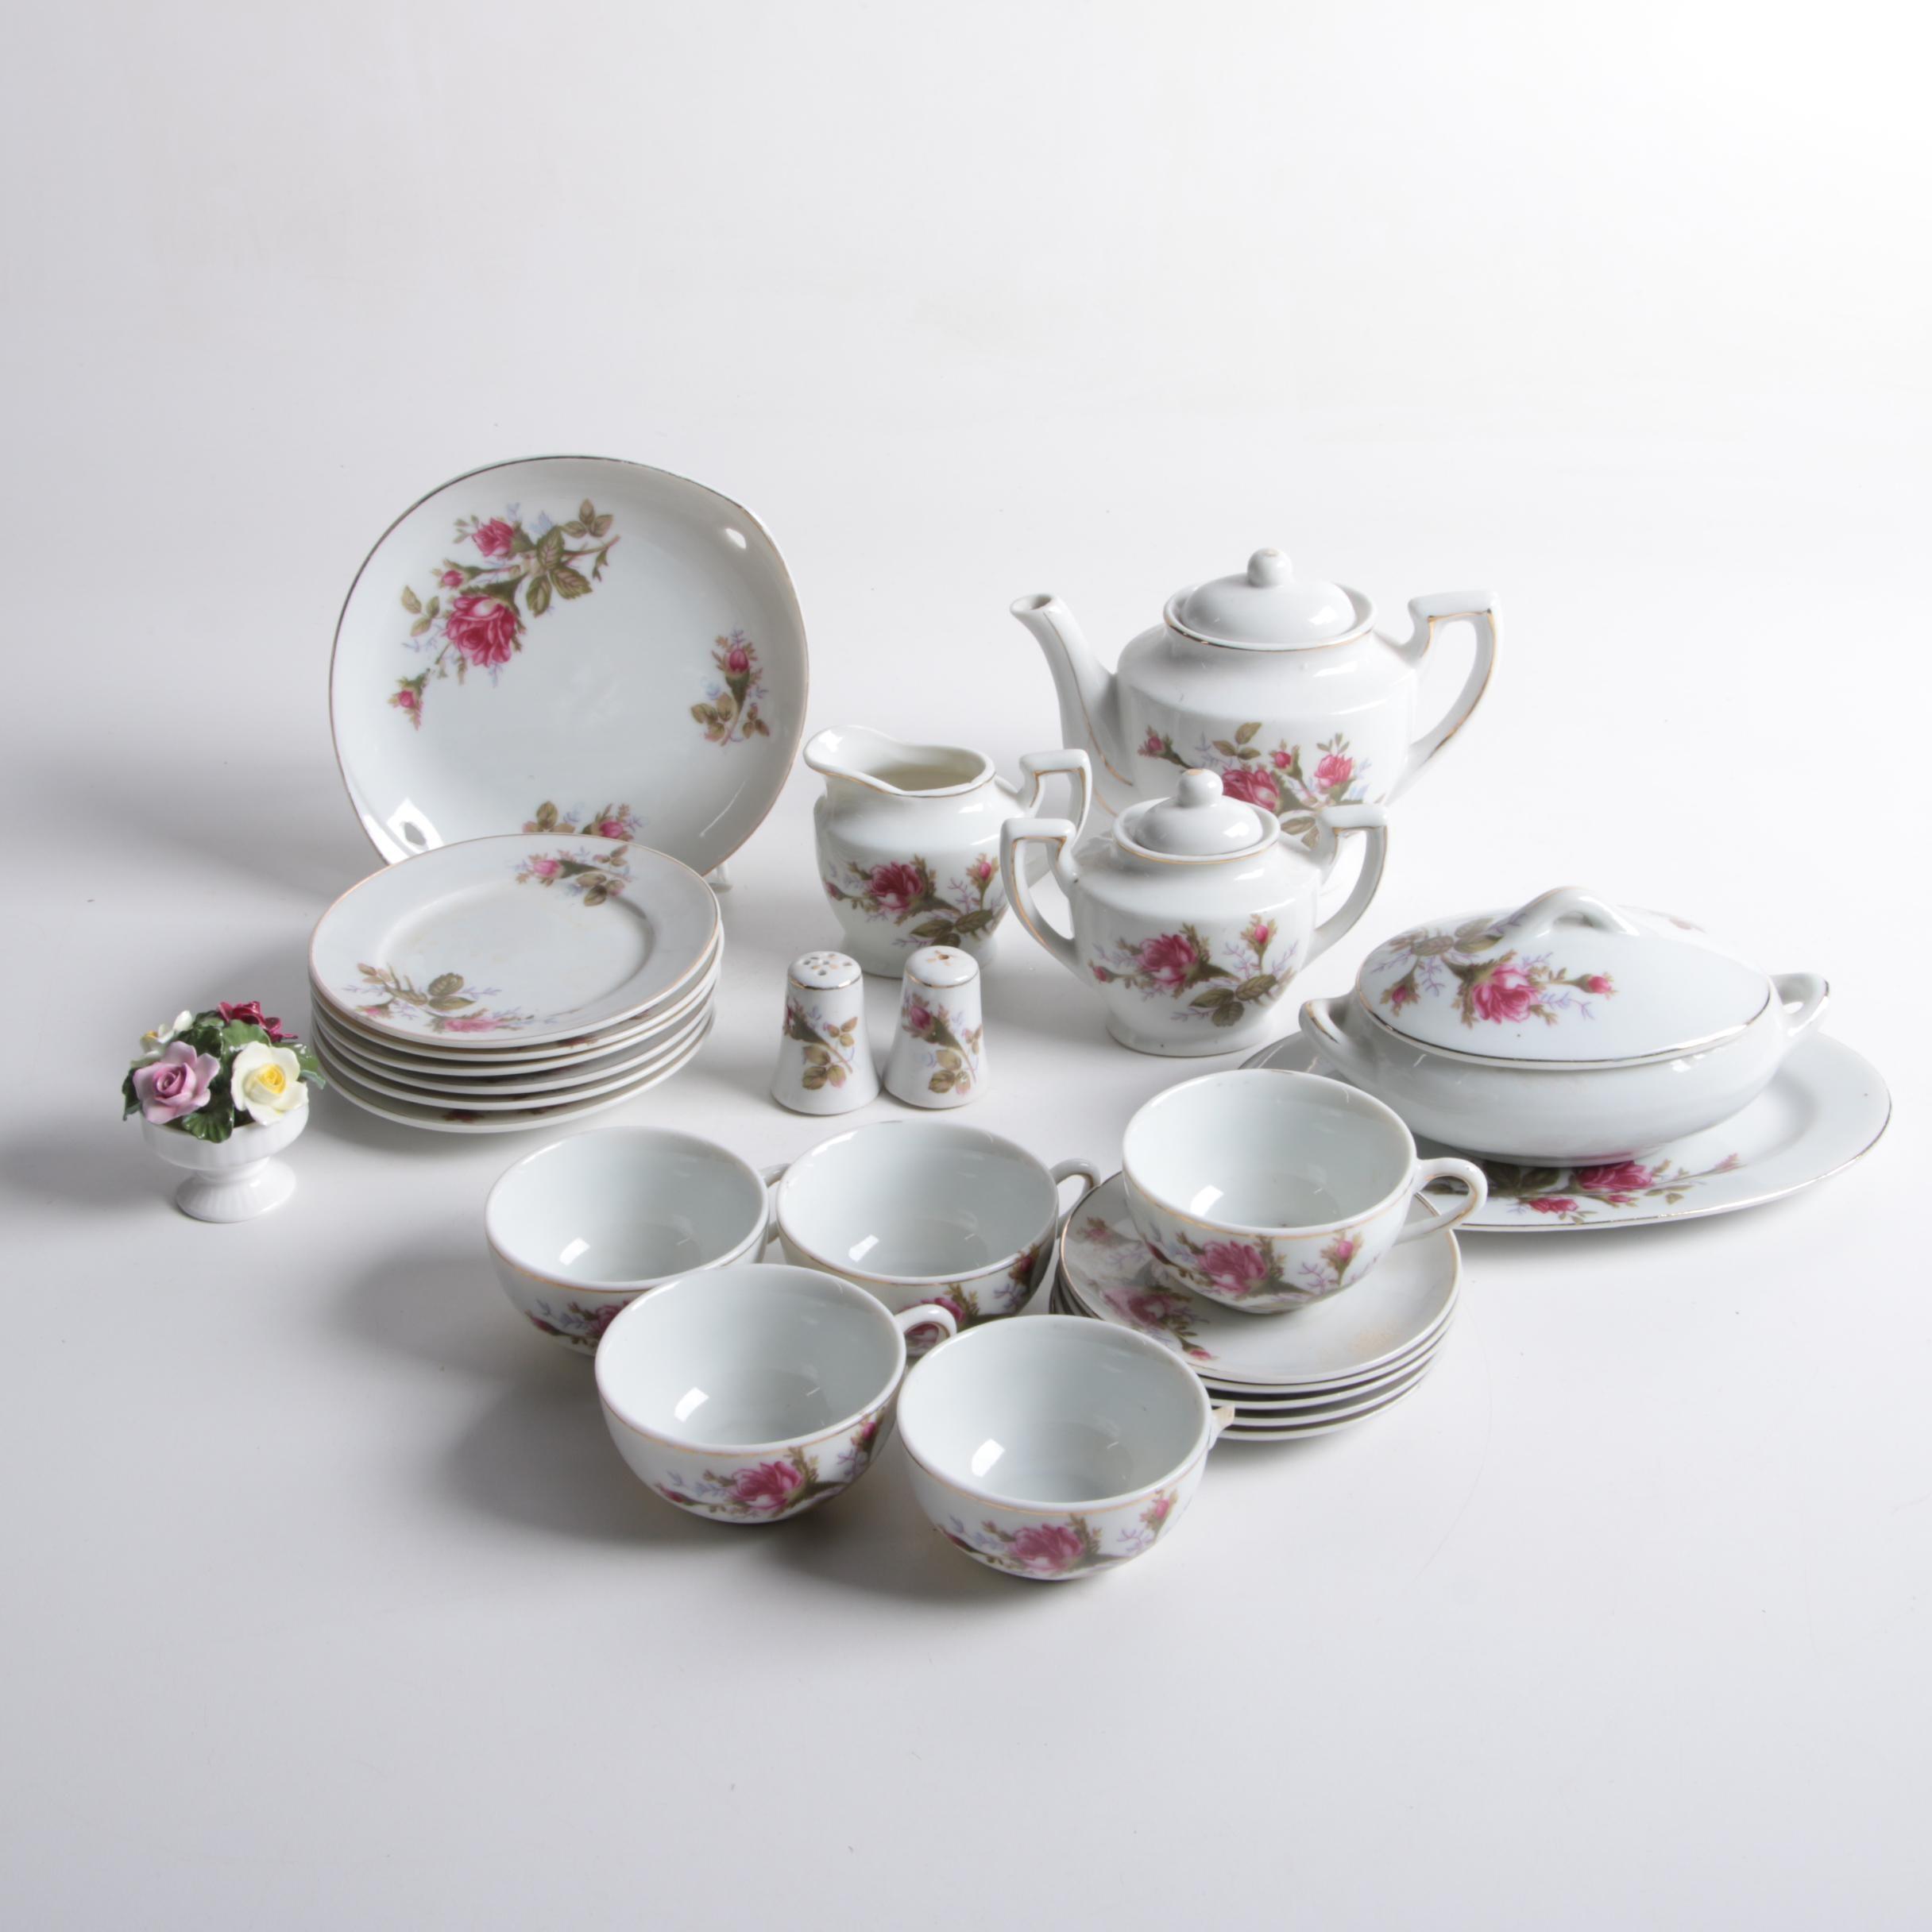 Japanese Porcelain Tea Set with Anysley Bone China Figurine